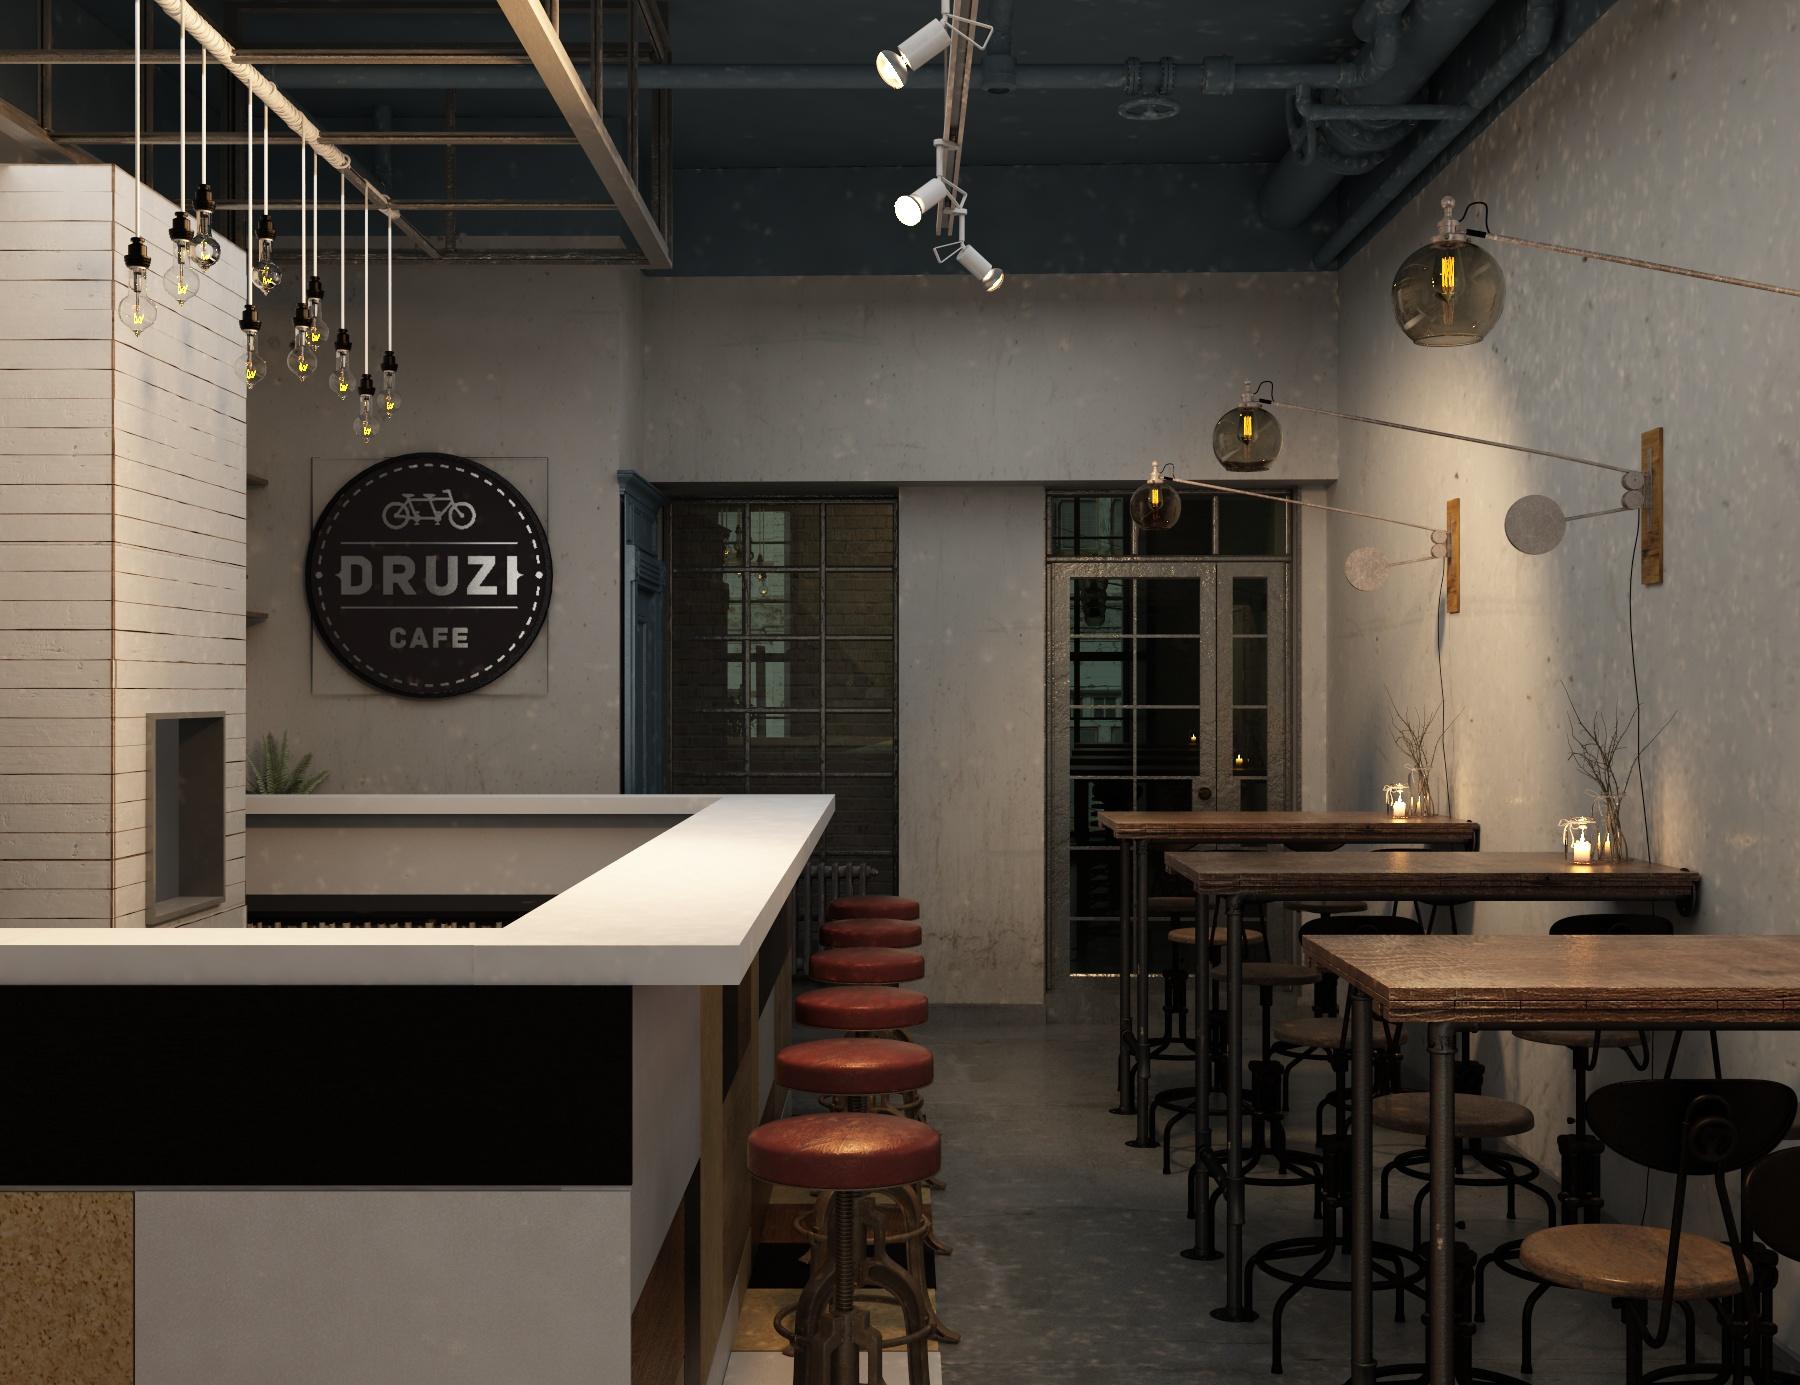 Druzi Cafe Lviv